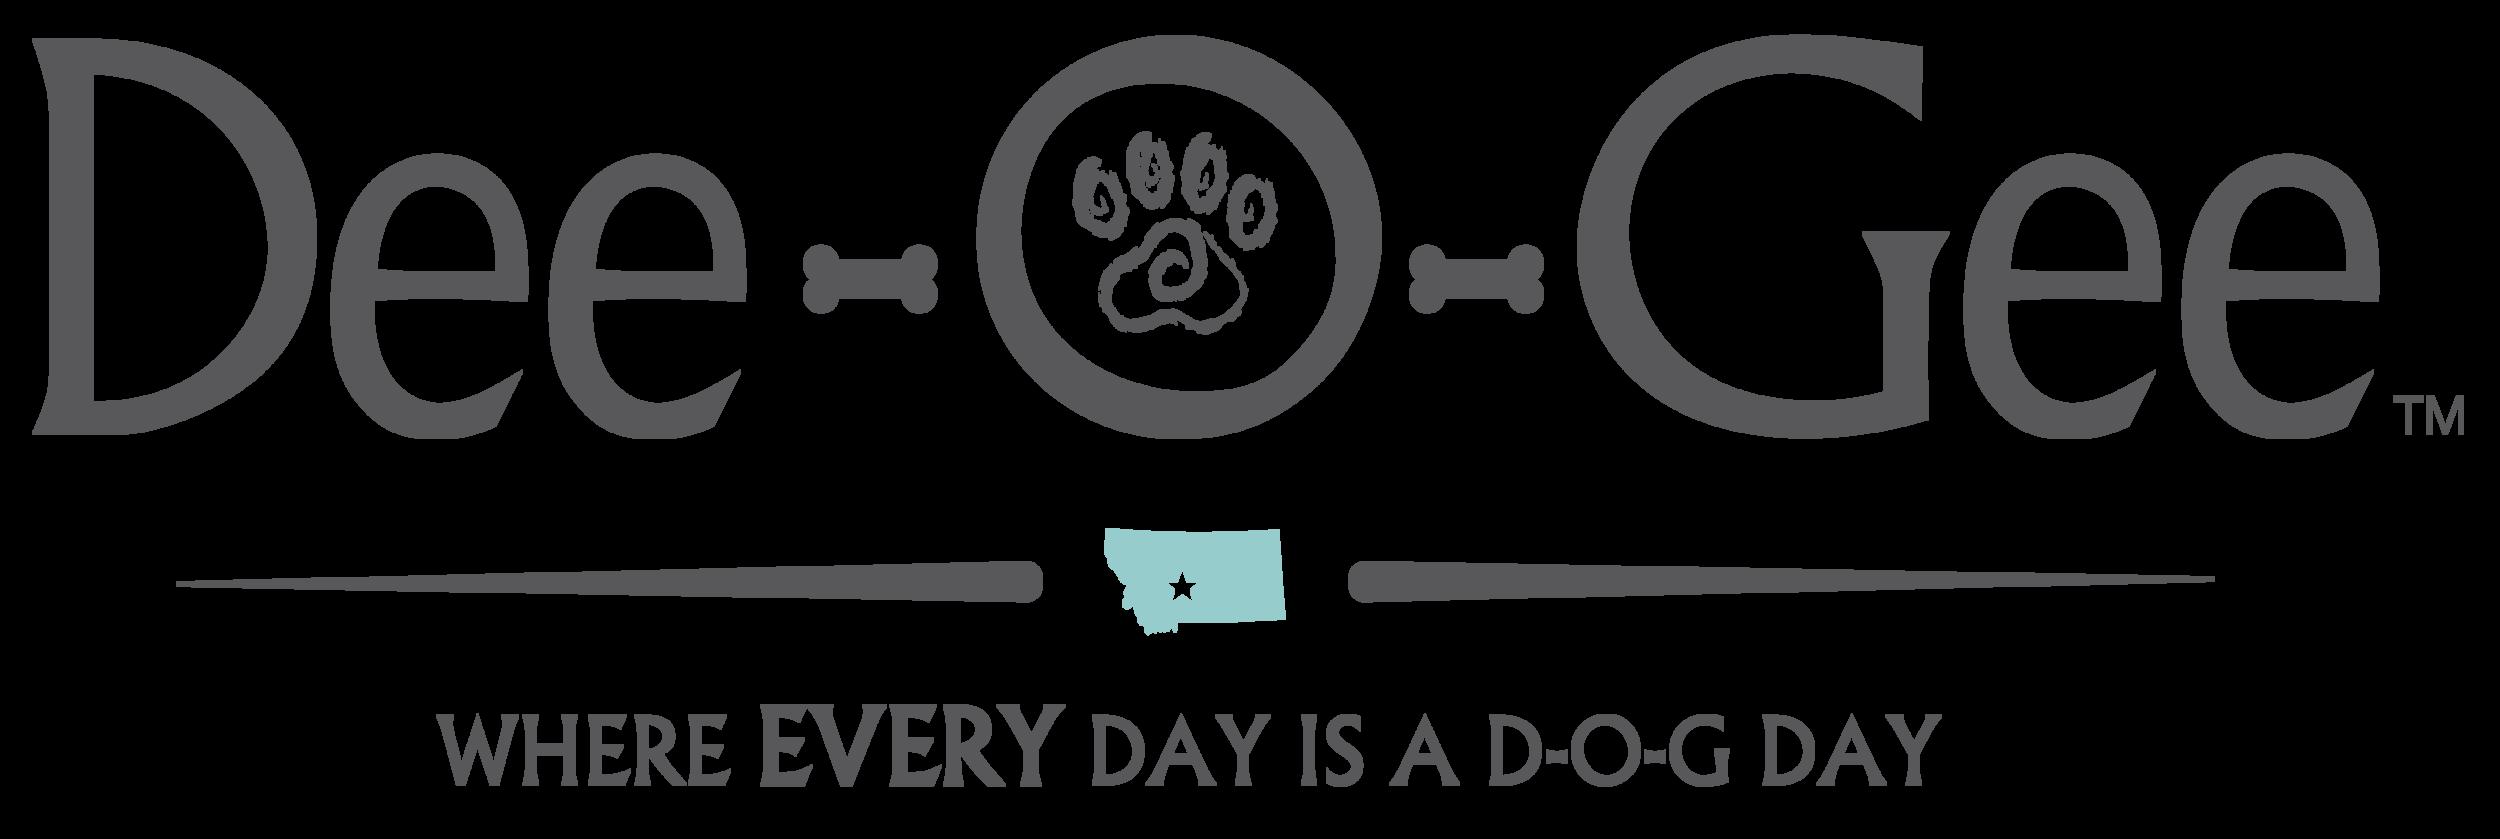 Dee-O-Gee logo.png